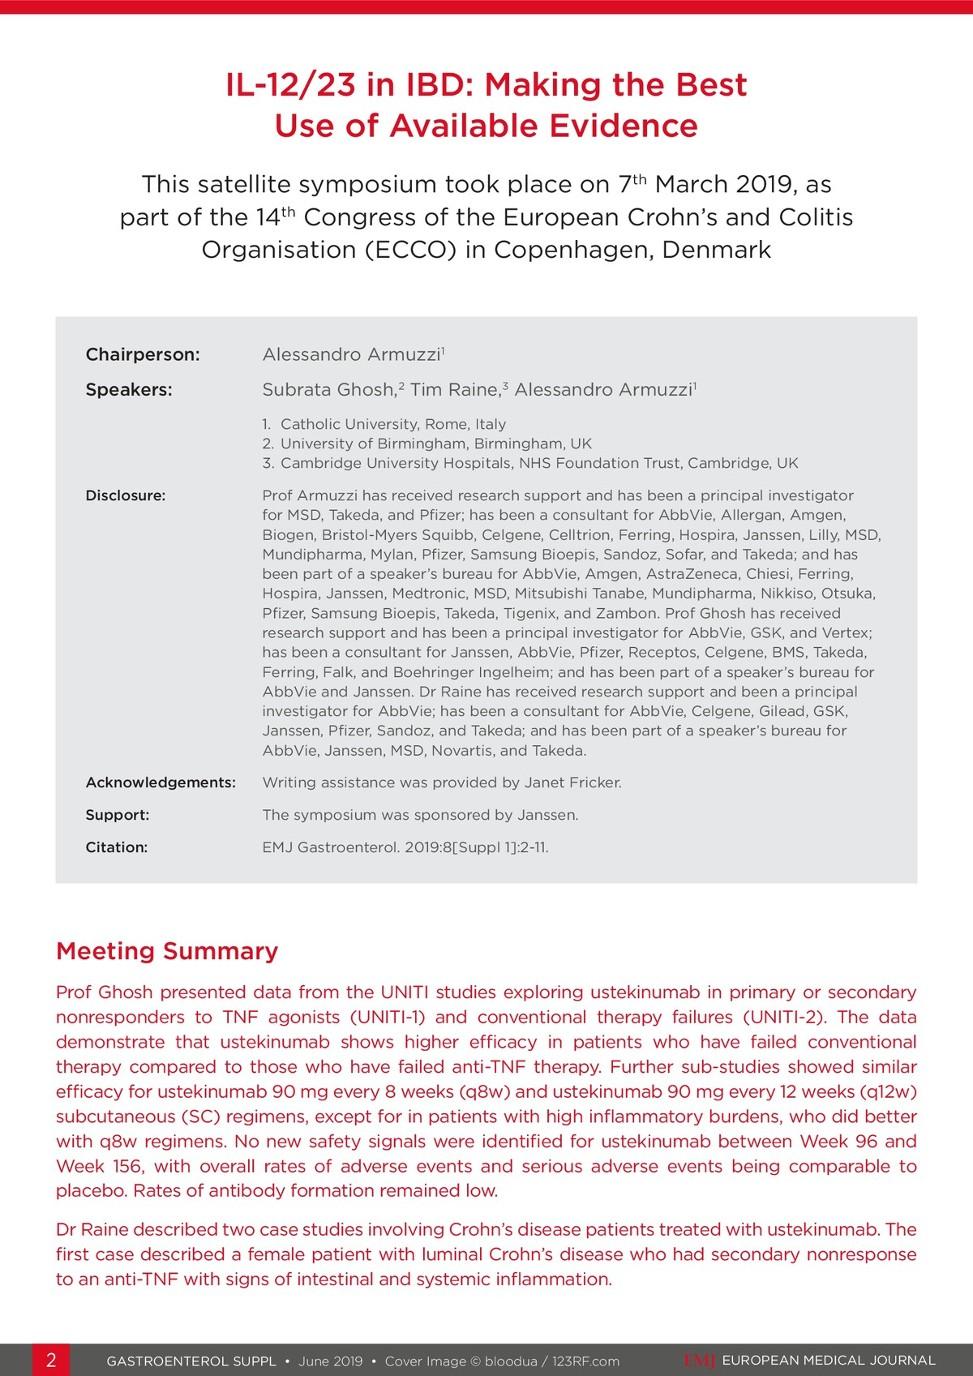 EMJ Gastroenterology 8 [Suppl 1] 2019 - European Medical Journal